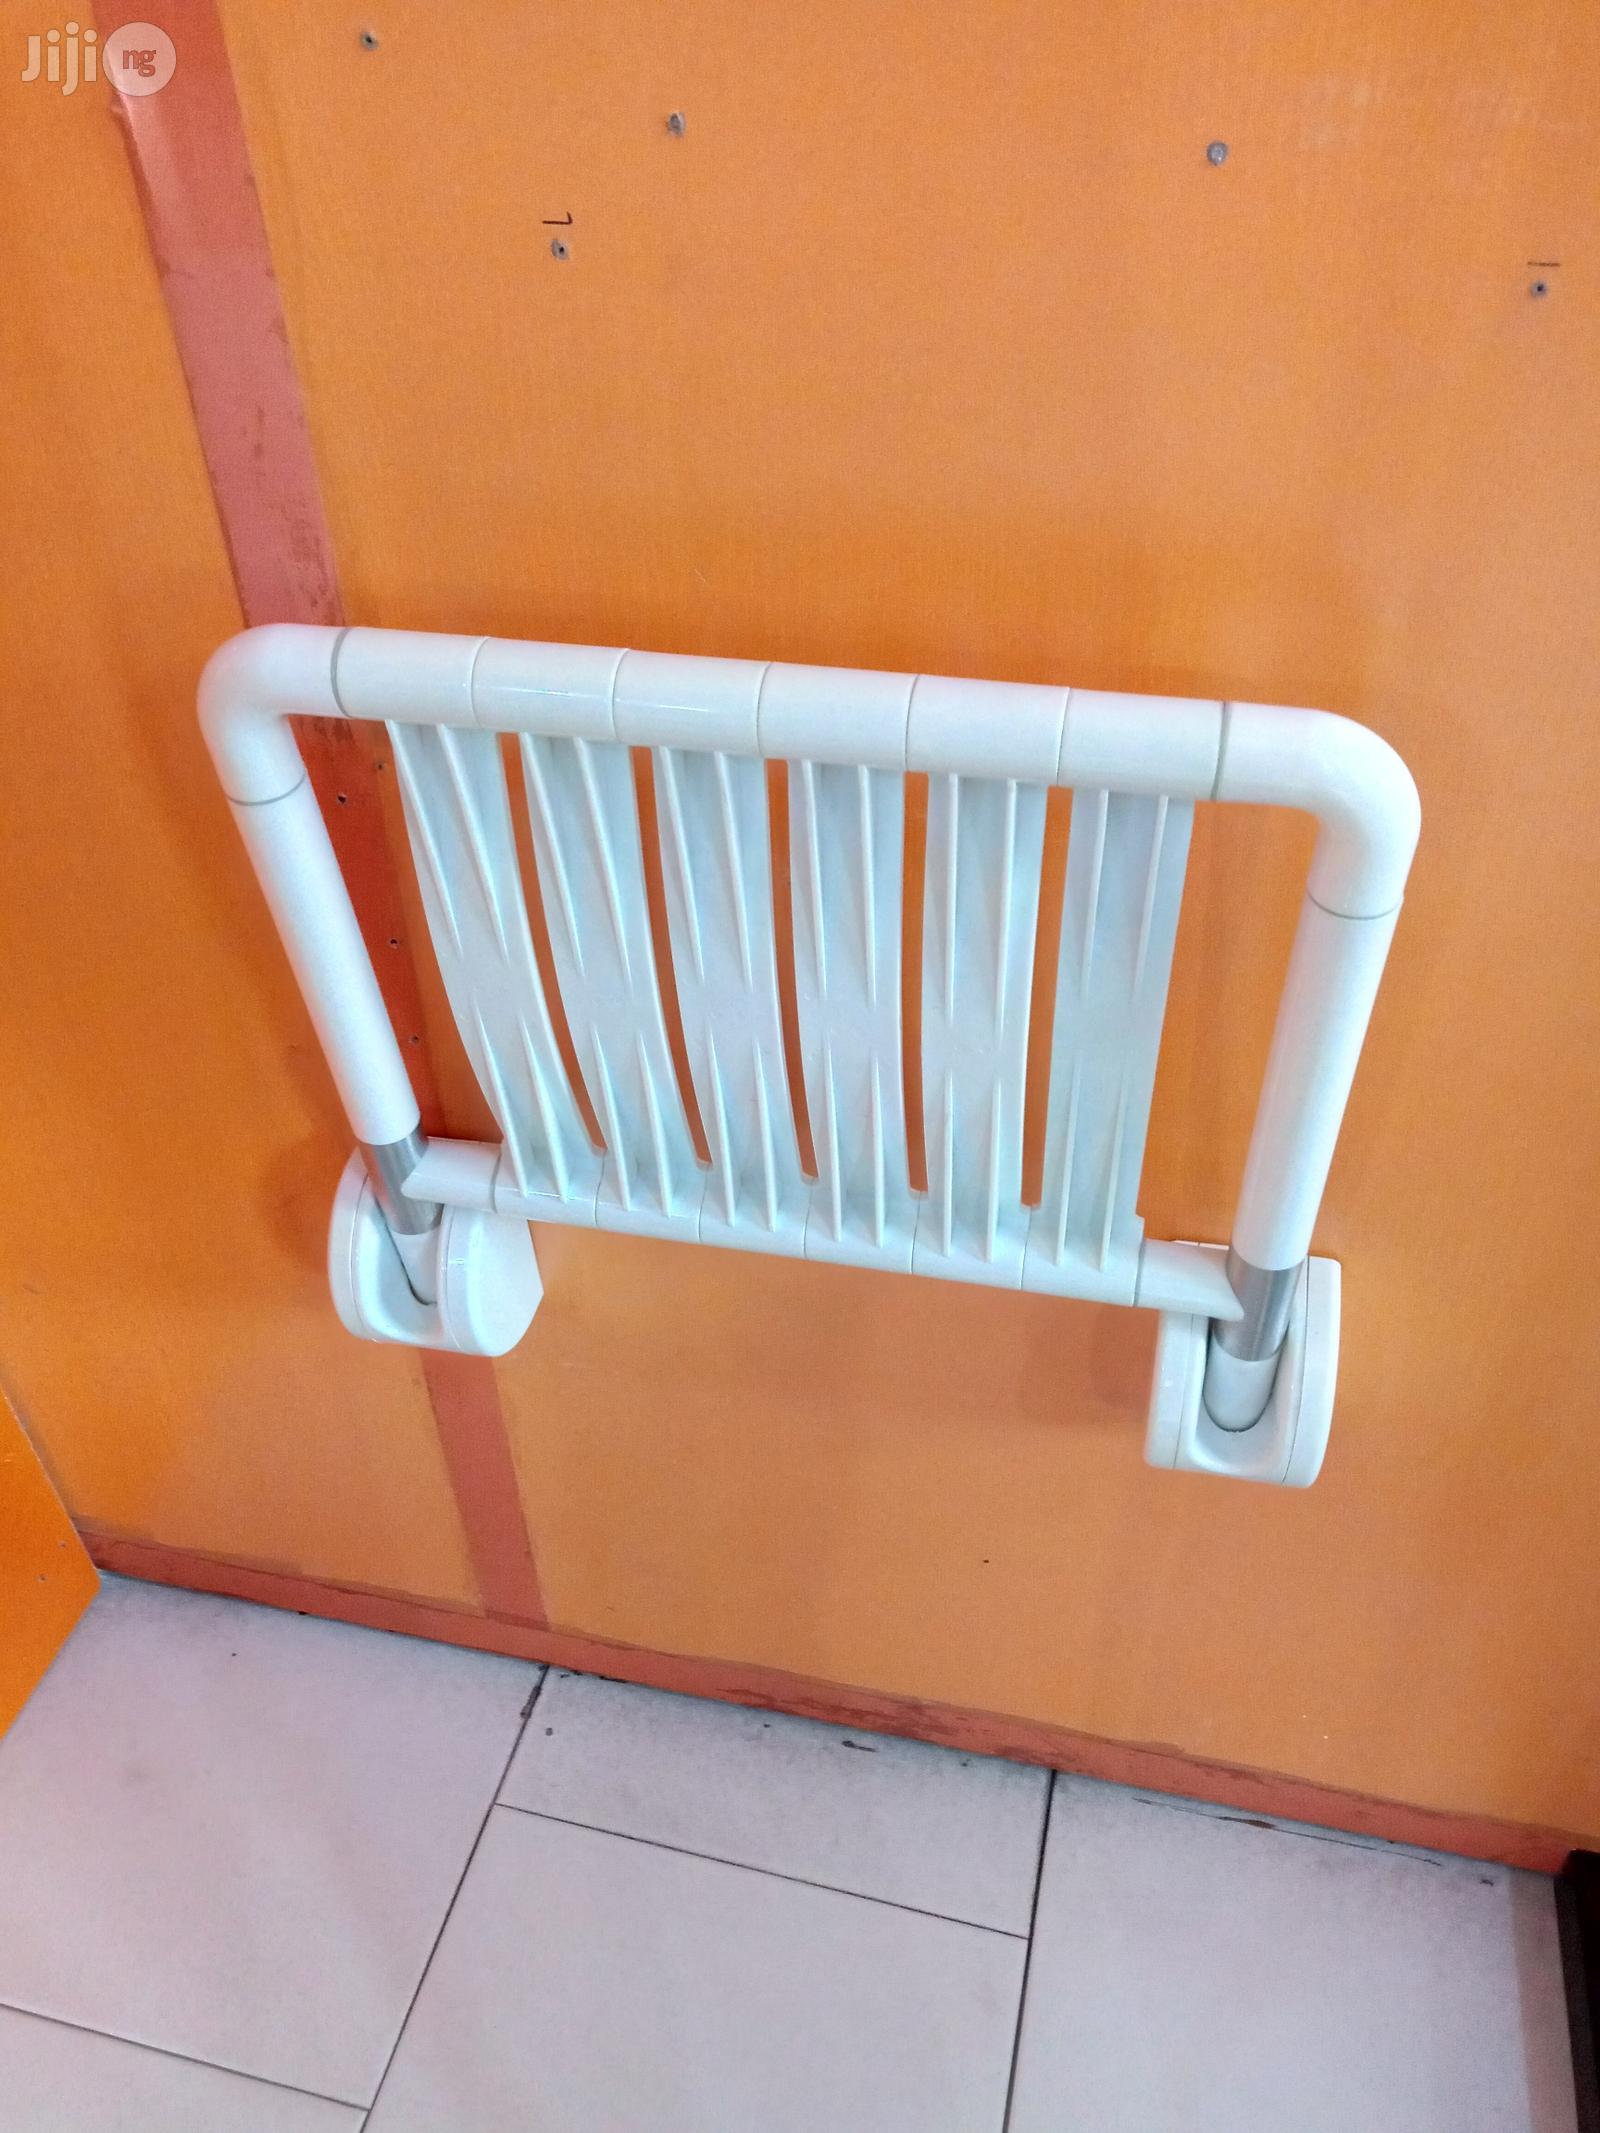 Adjustable Shower Seat (Original UK) | Home Accessories for sale in Lagos State, Nigeria